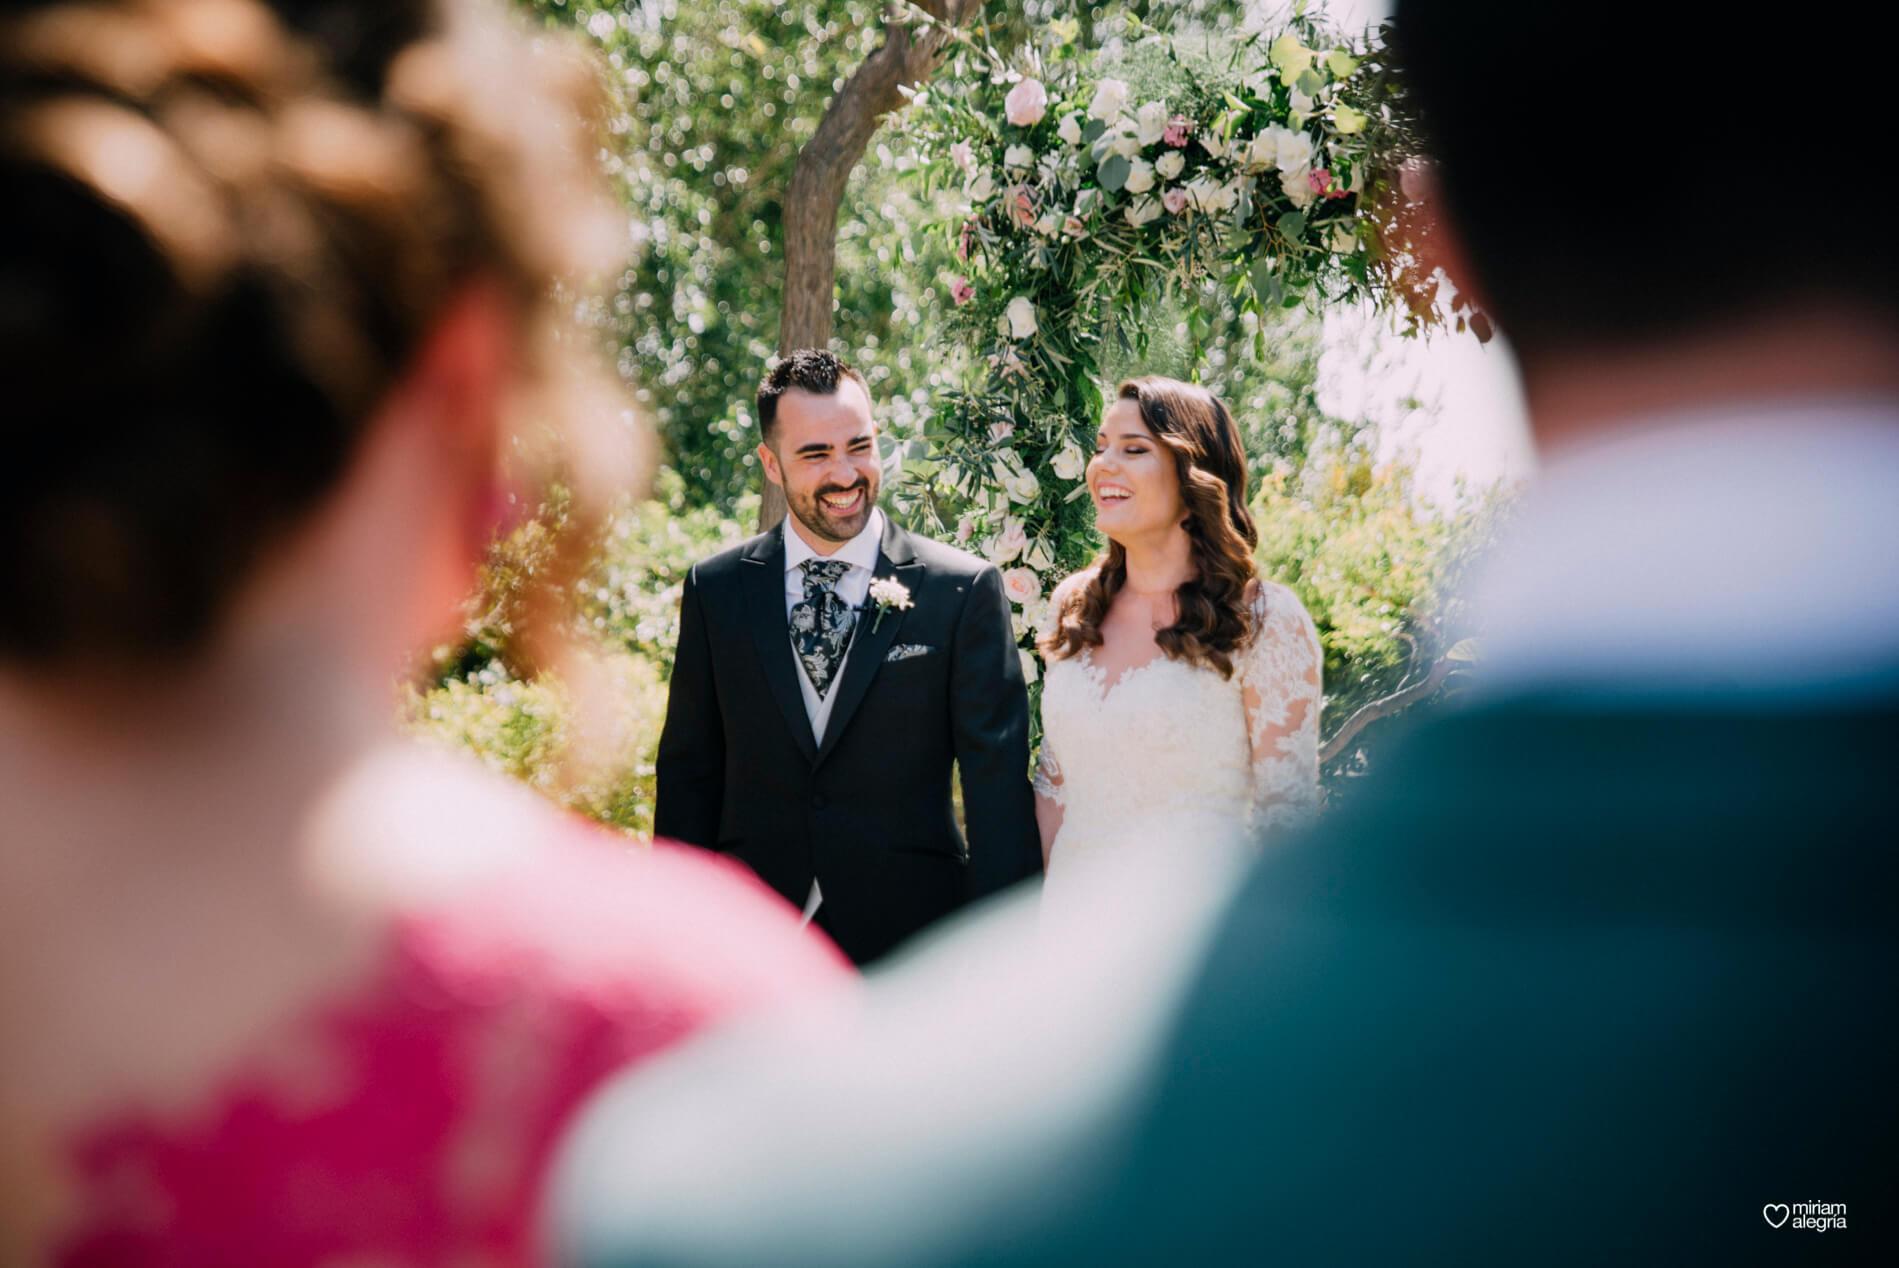 boda-en-finca-jurosa-miriam-alegria-51